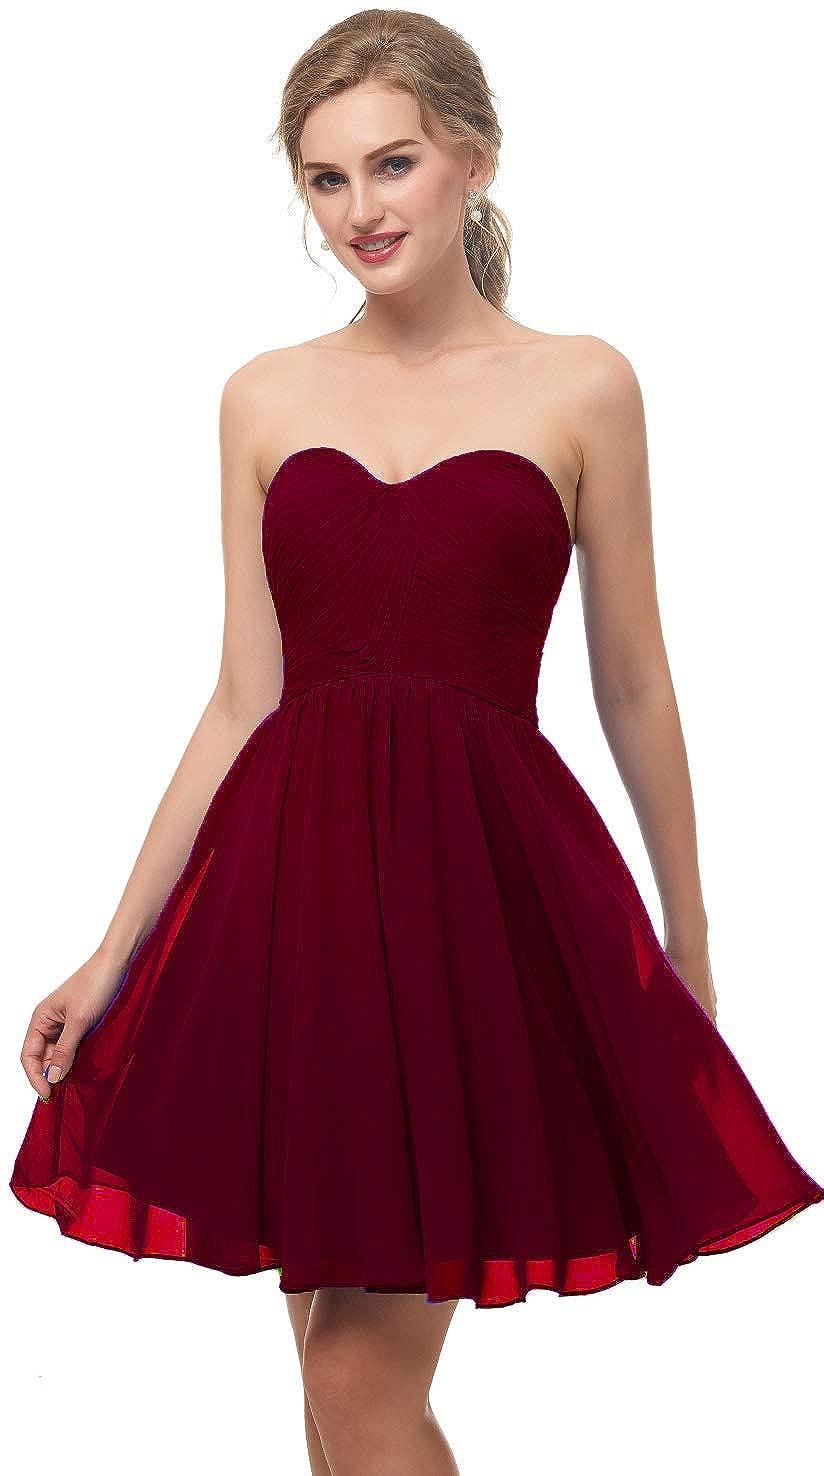 45ae01020f0a0 Royal Blue Grad Dresses Short